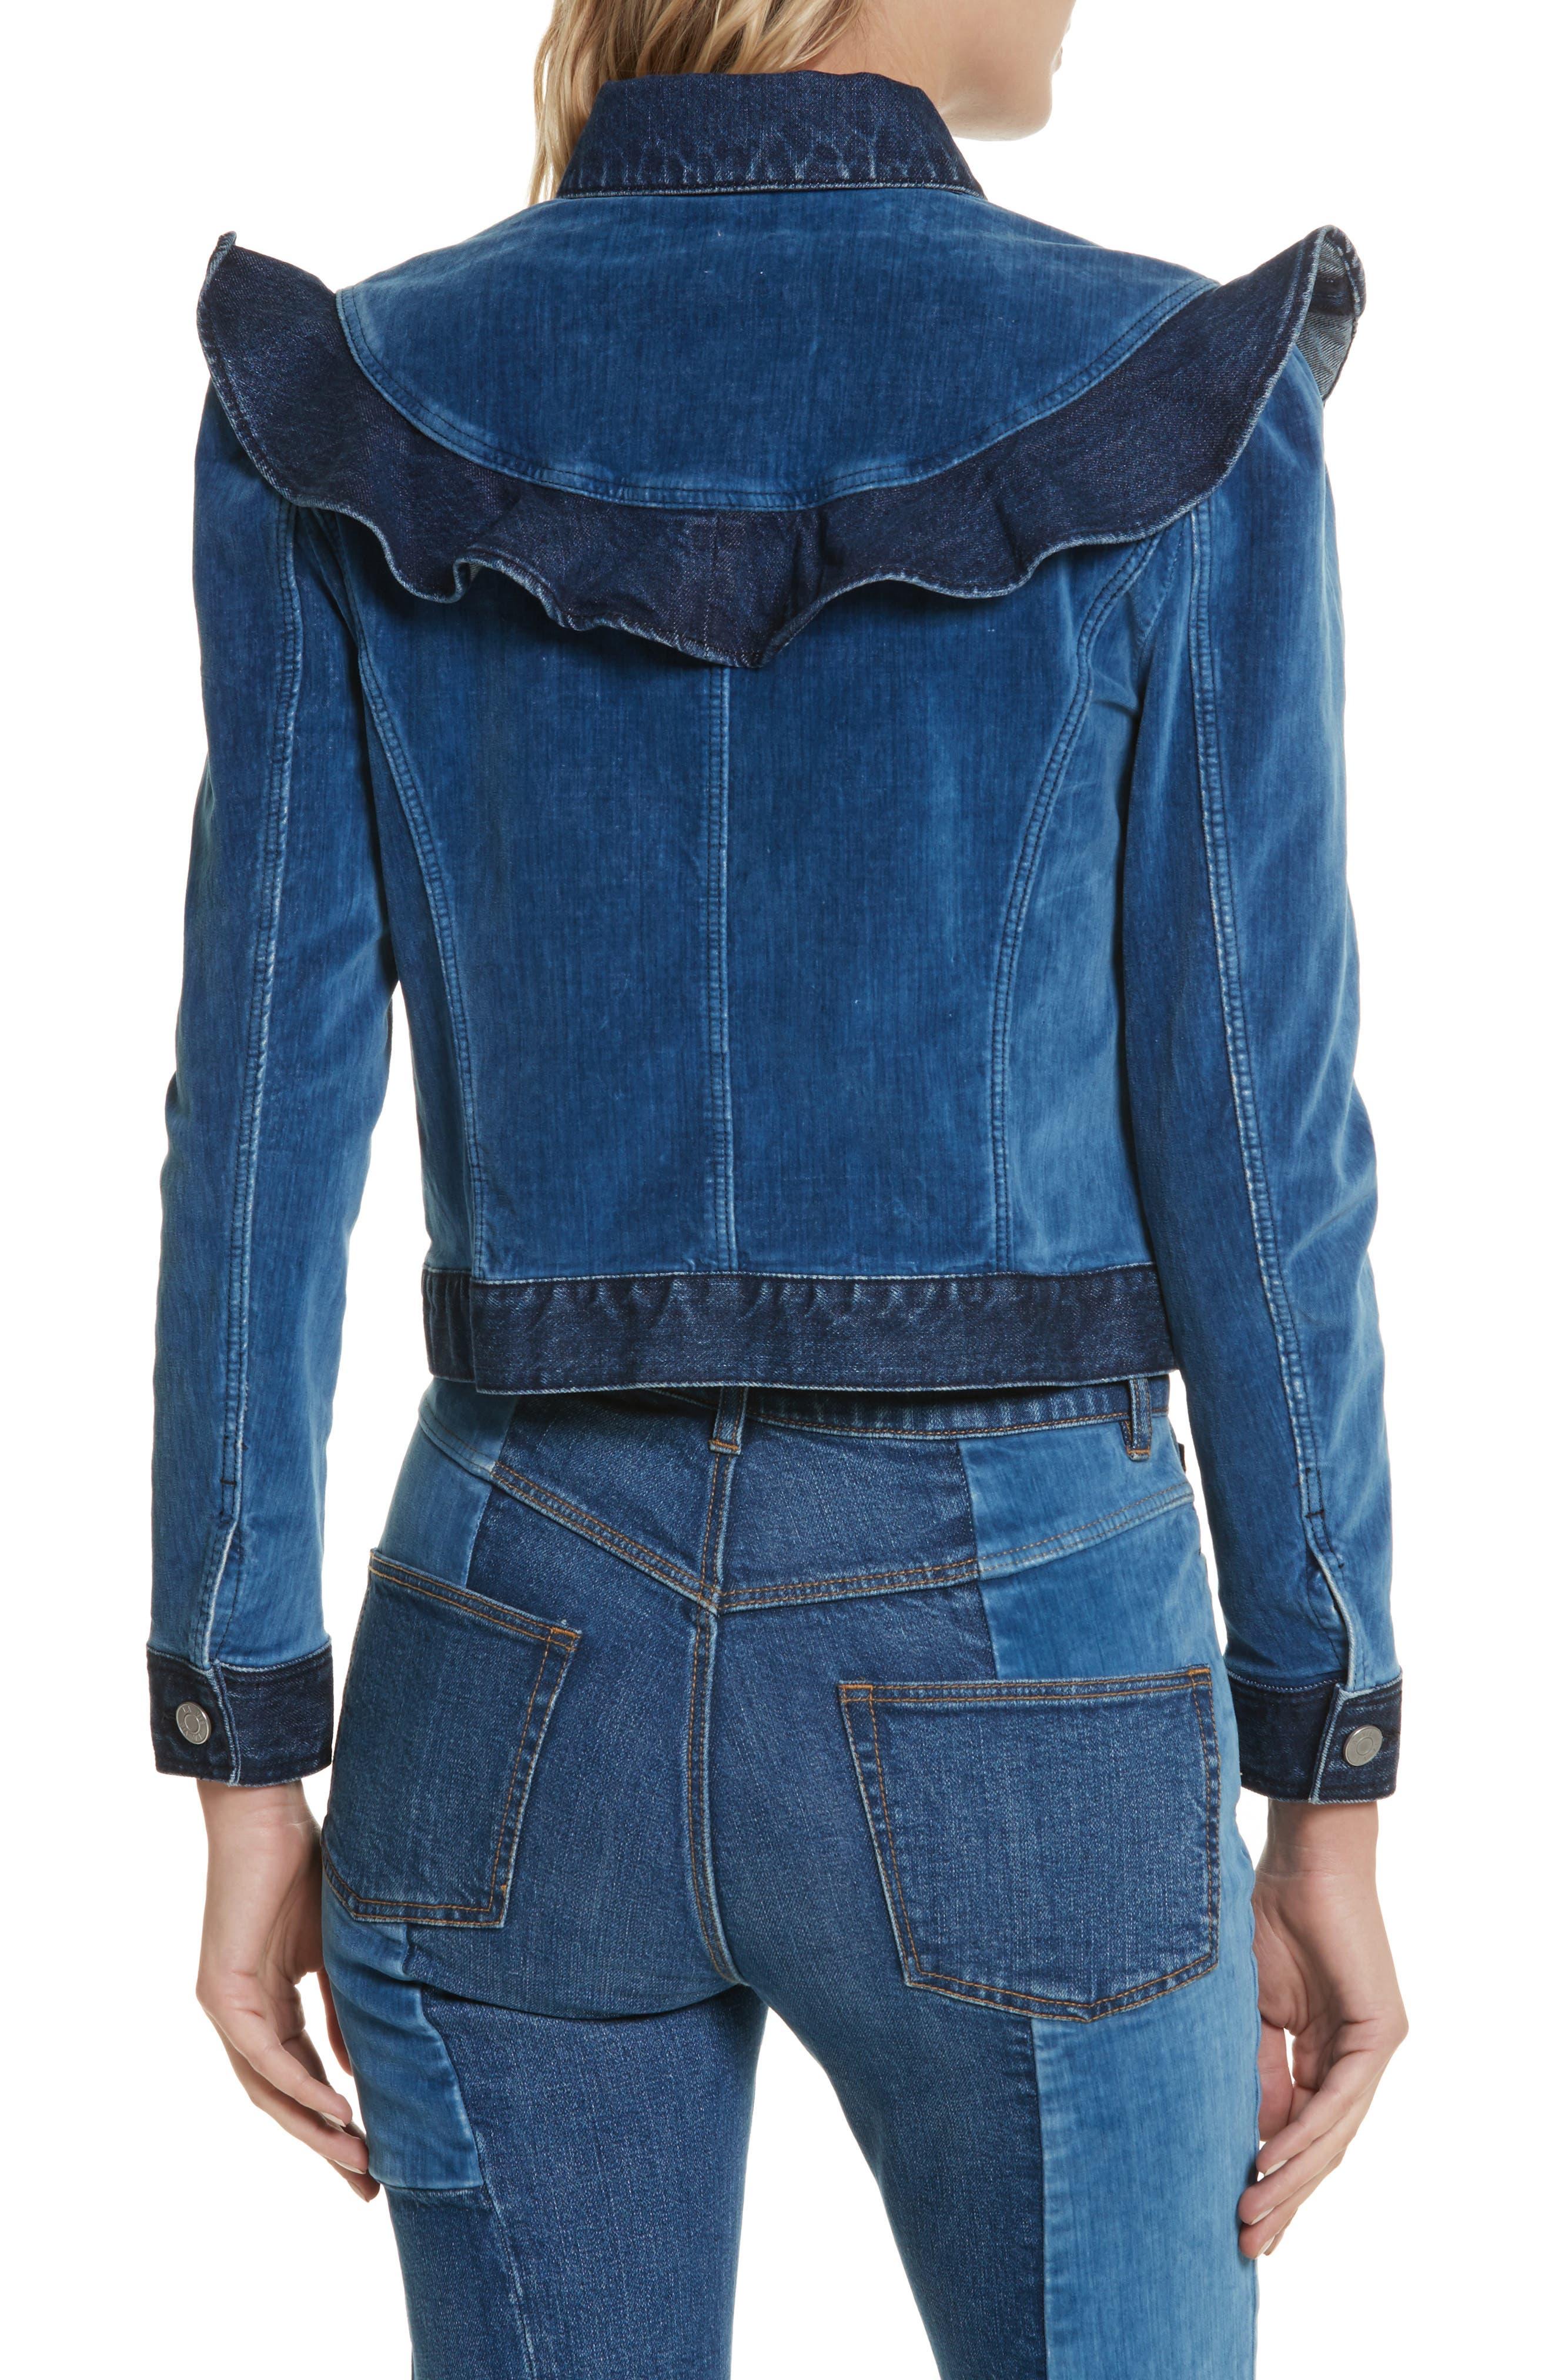 Velvet Denim Jacket,                             Alternate thumbnail 2, color,                             Dark Blueprint Patch Wash